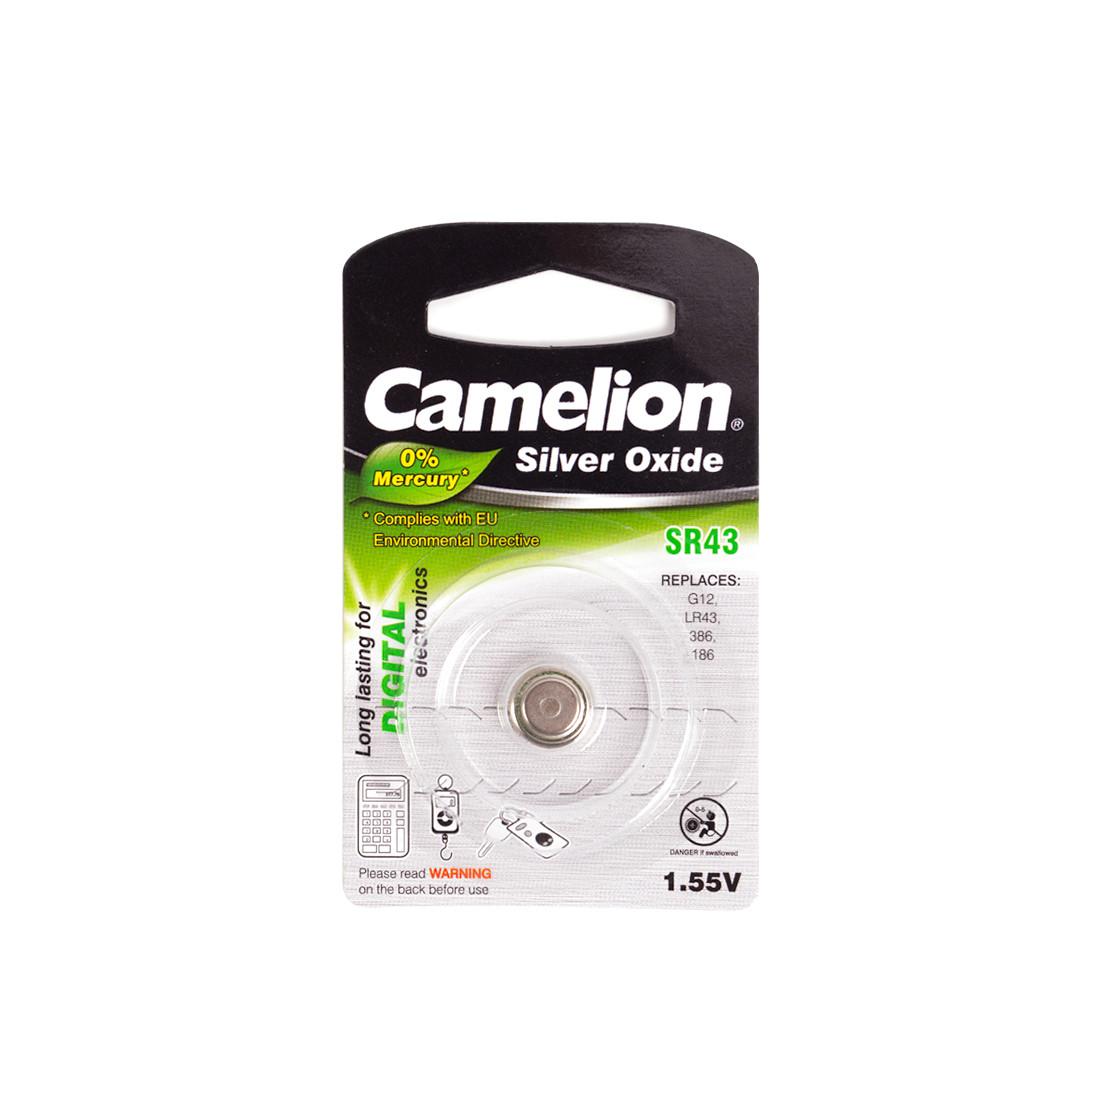 Батарейка CAMELION SR43-BP1(0%Hg)  Silver Oxide 1.55V 0% Ртути 1 шт. Блистер